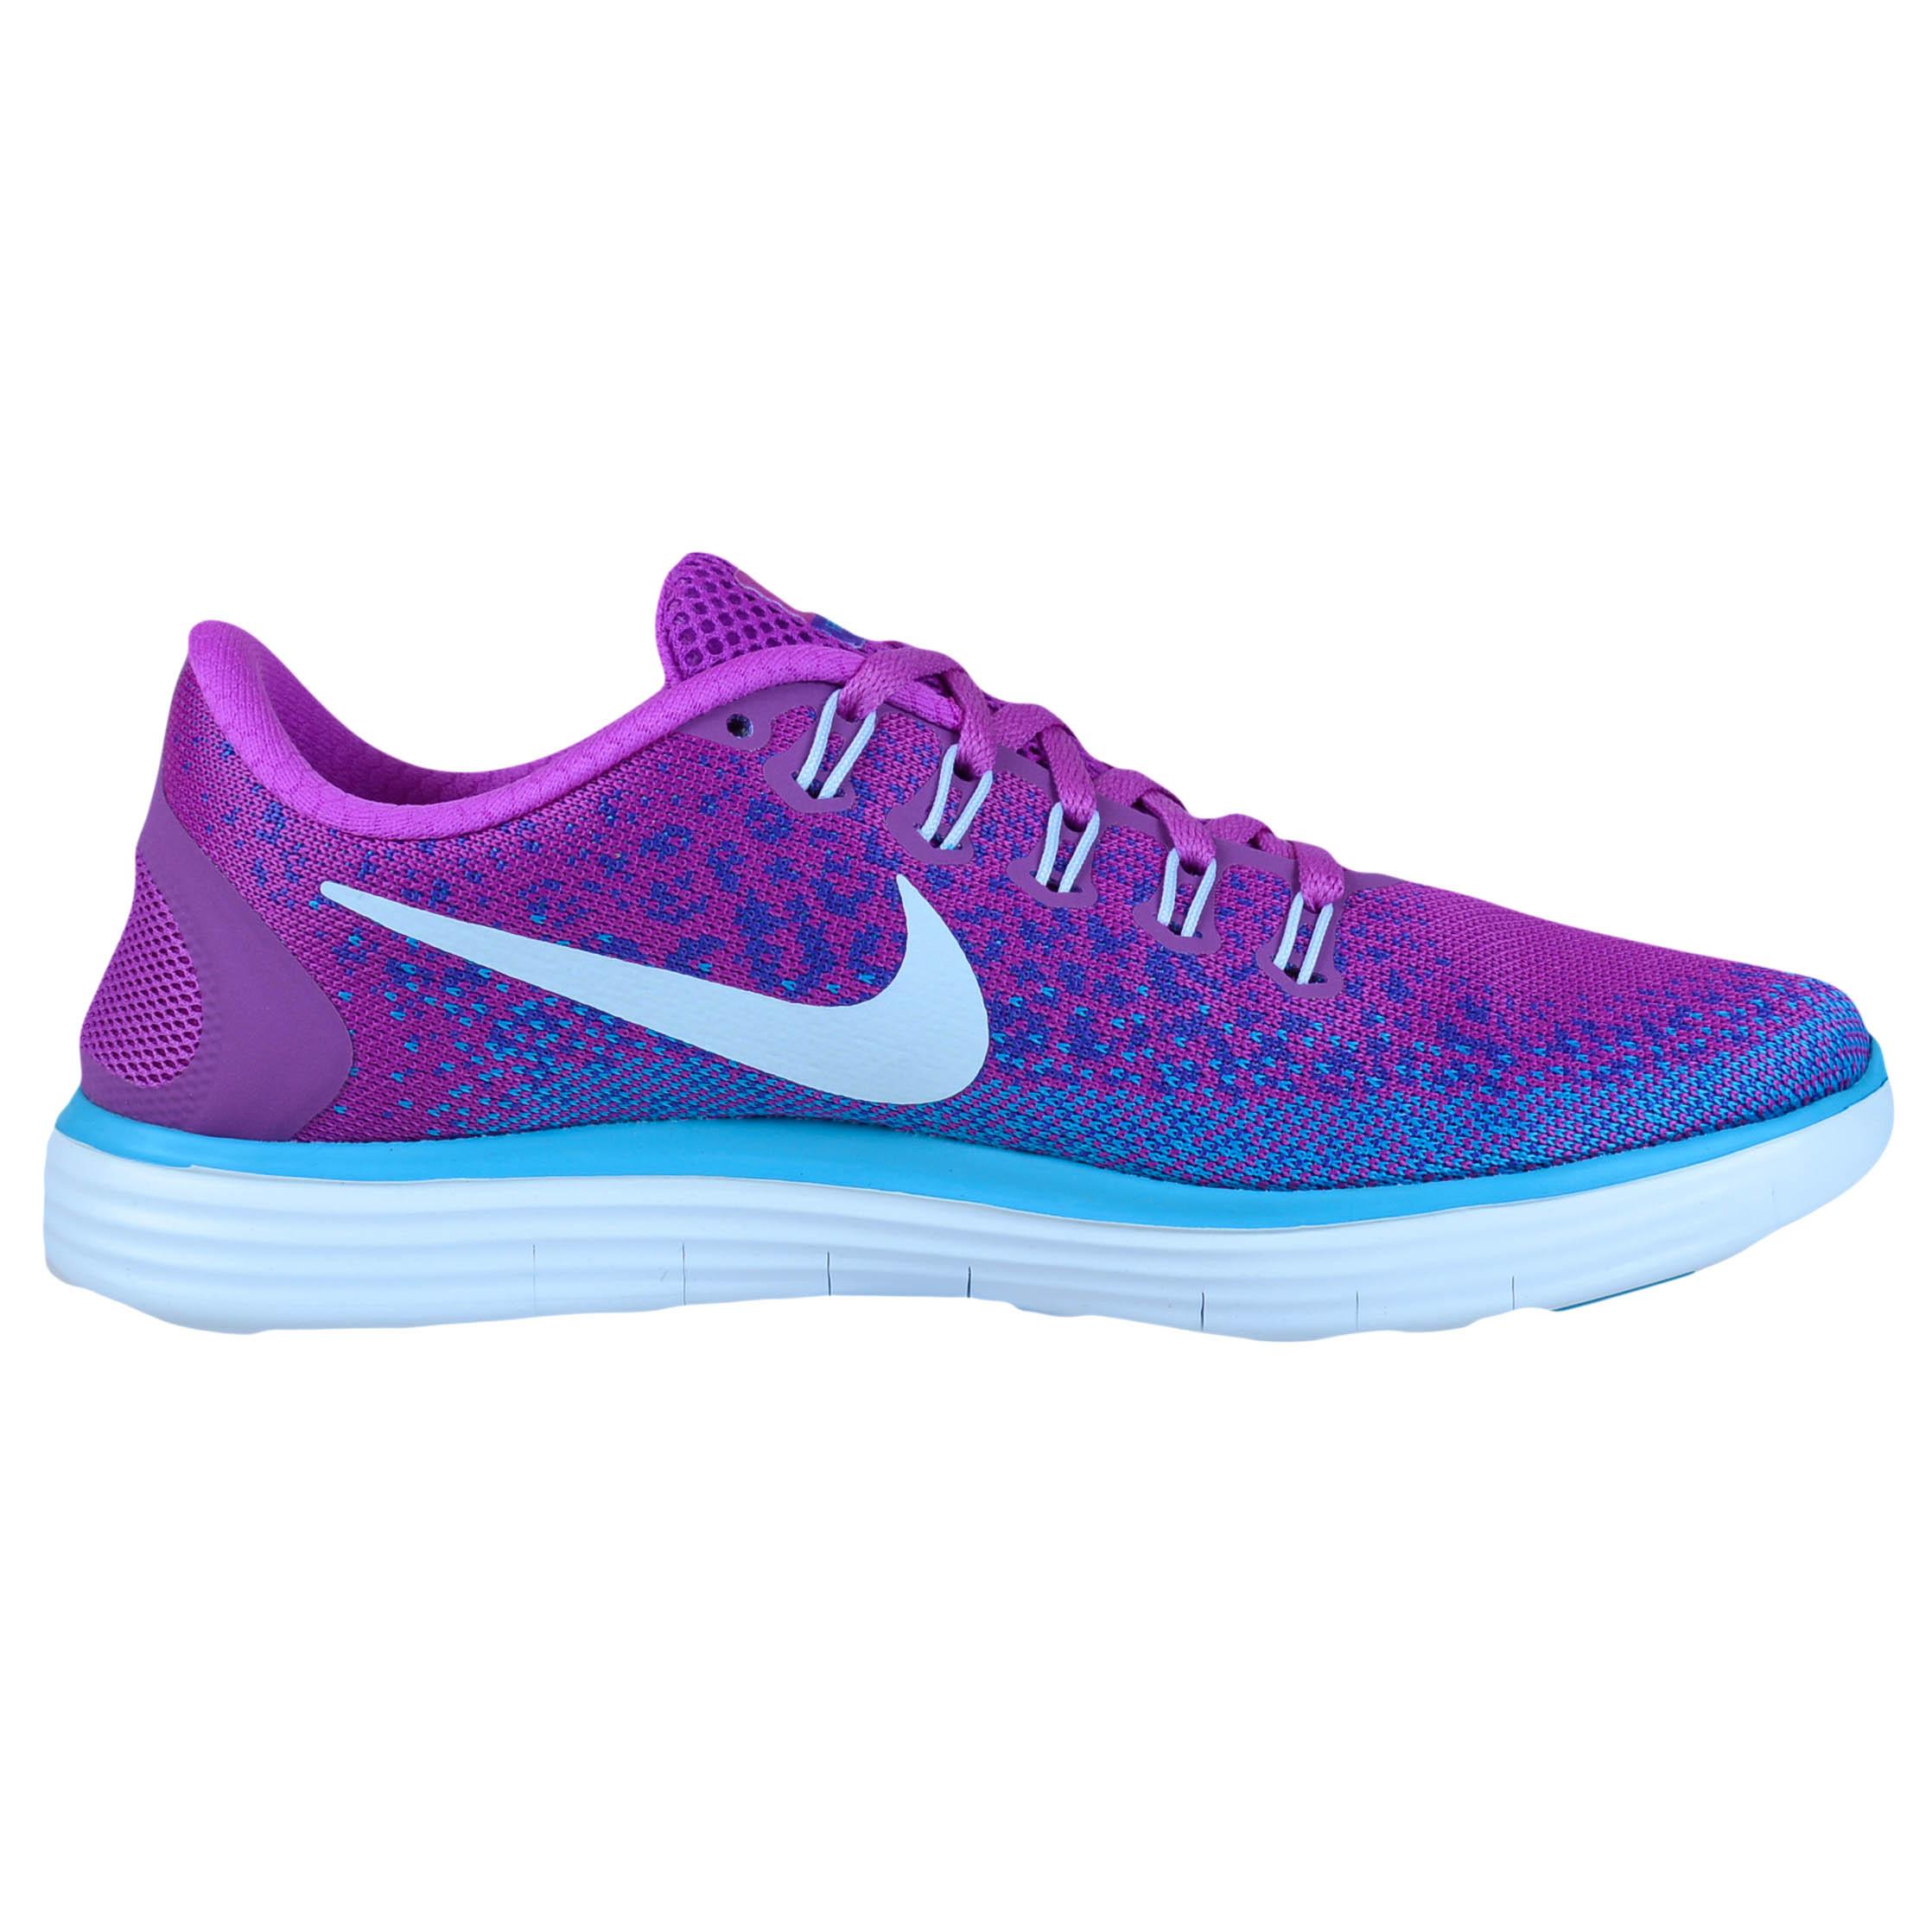 4dca154820ce nike current running distance womens shox nzxfur2194-Chaussures ...